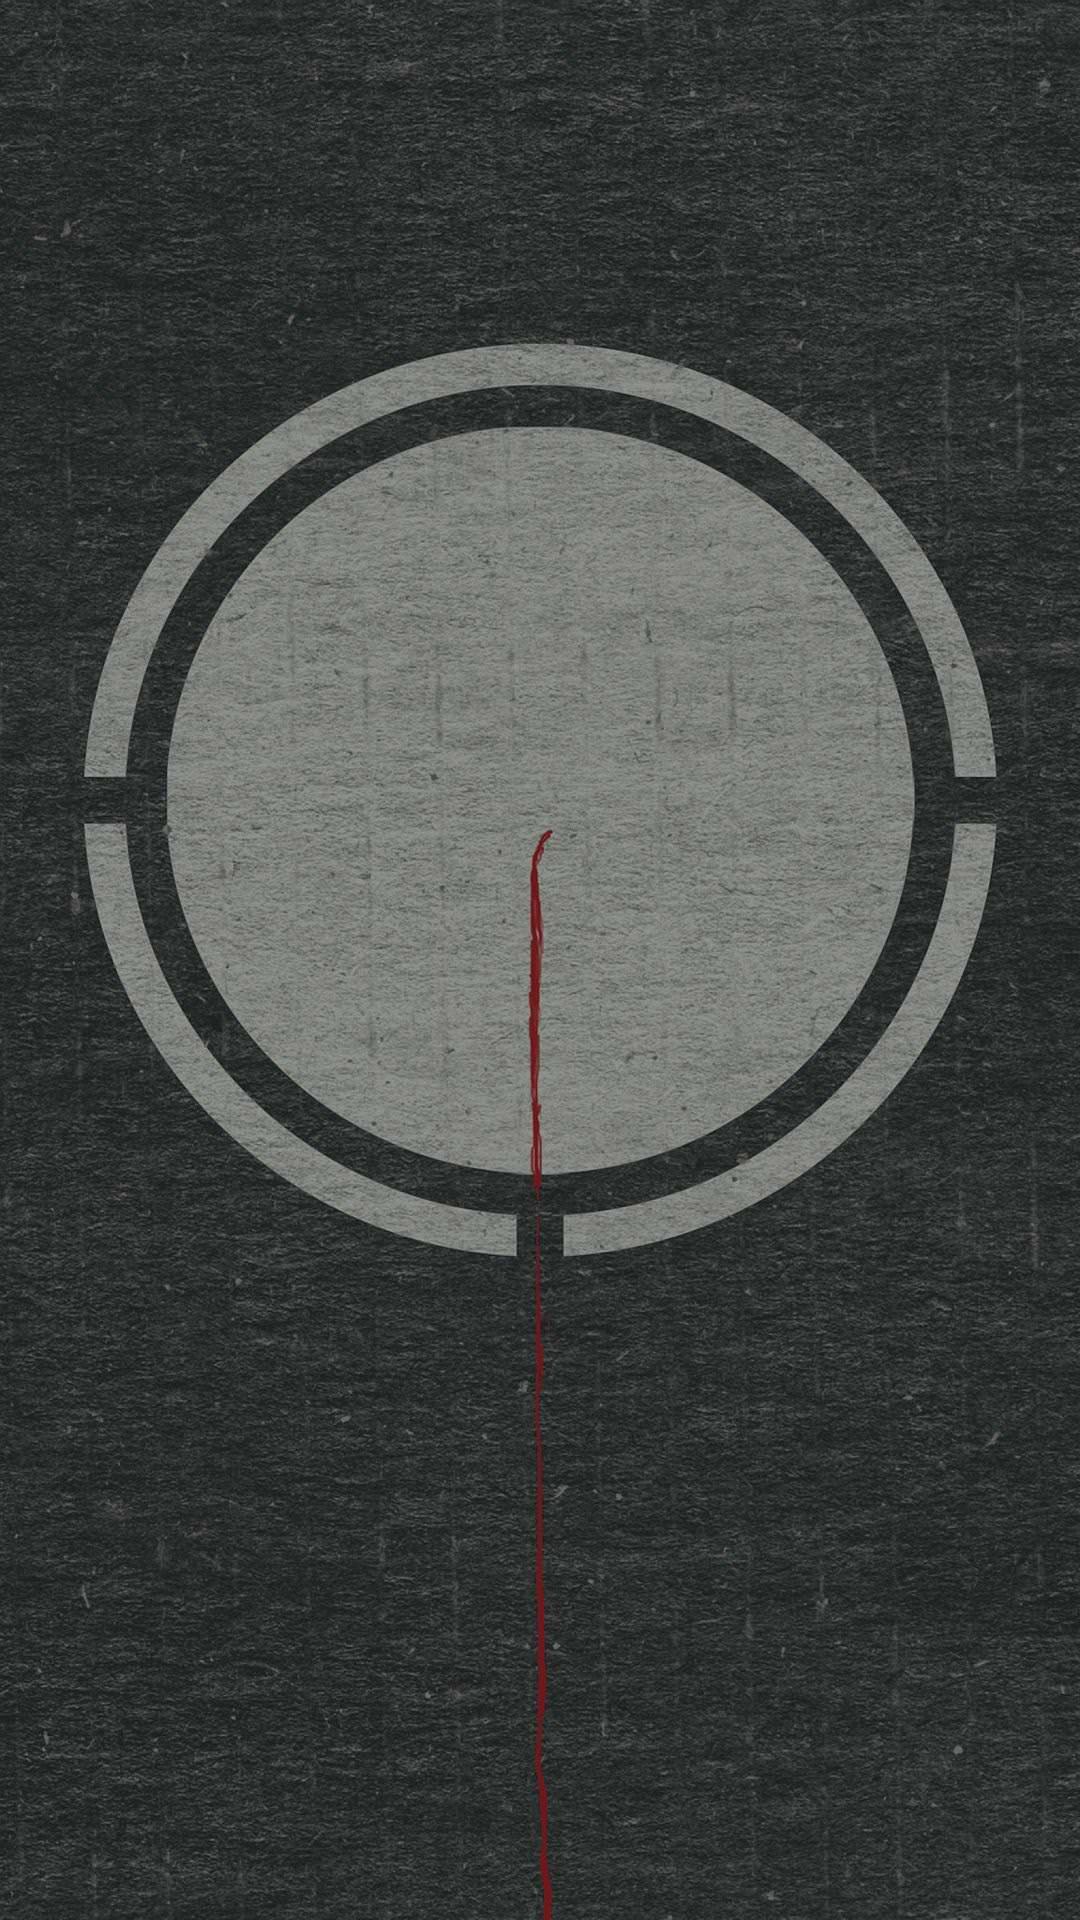 Nine Inch Nails Corona Radiata Iphone Wallpaper